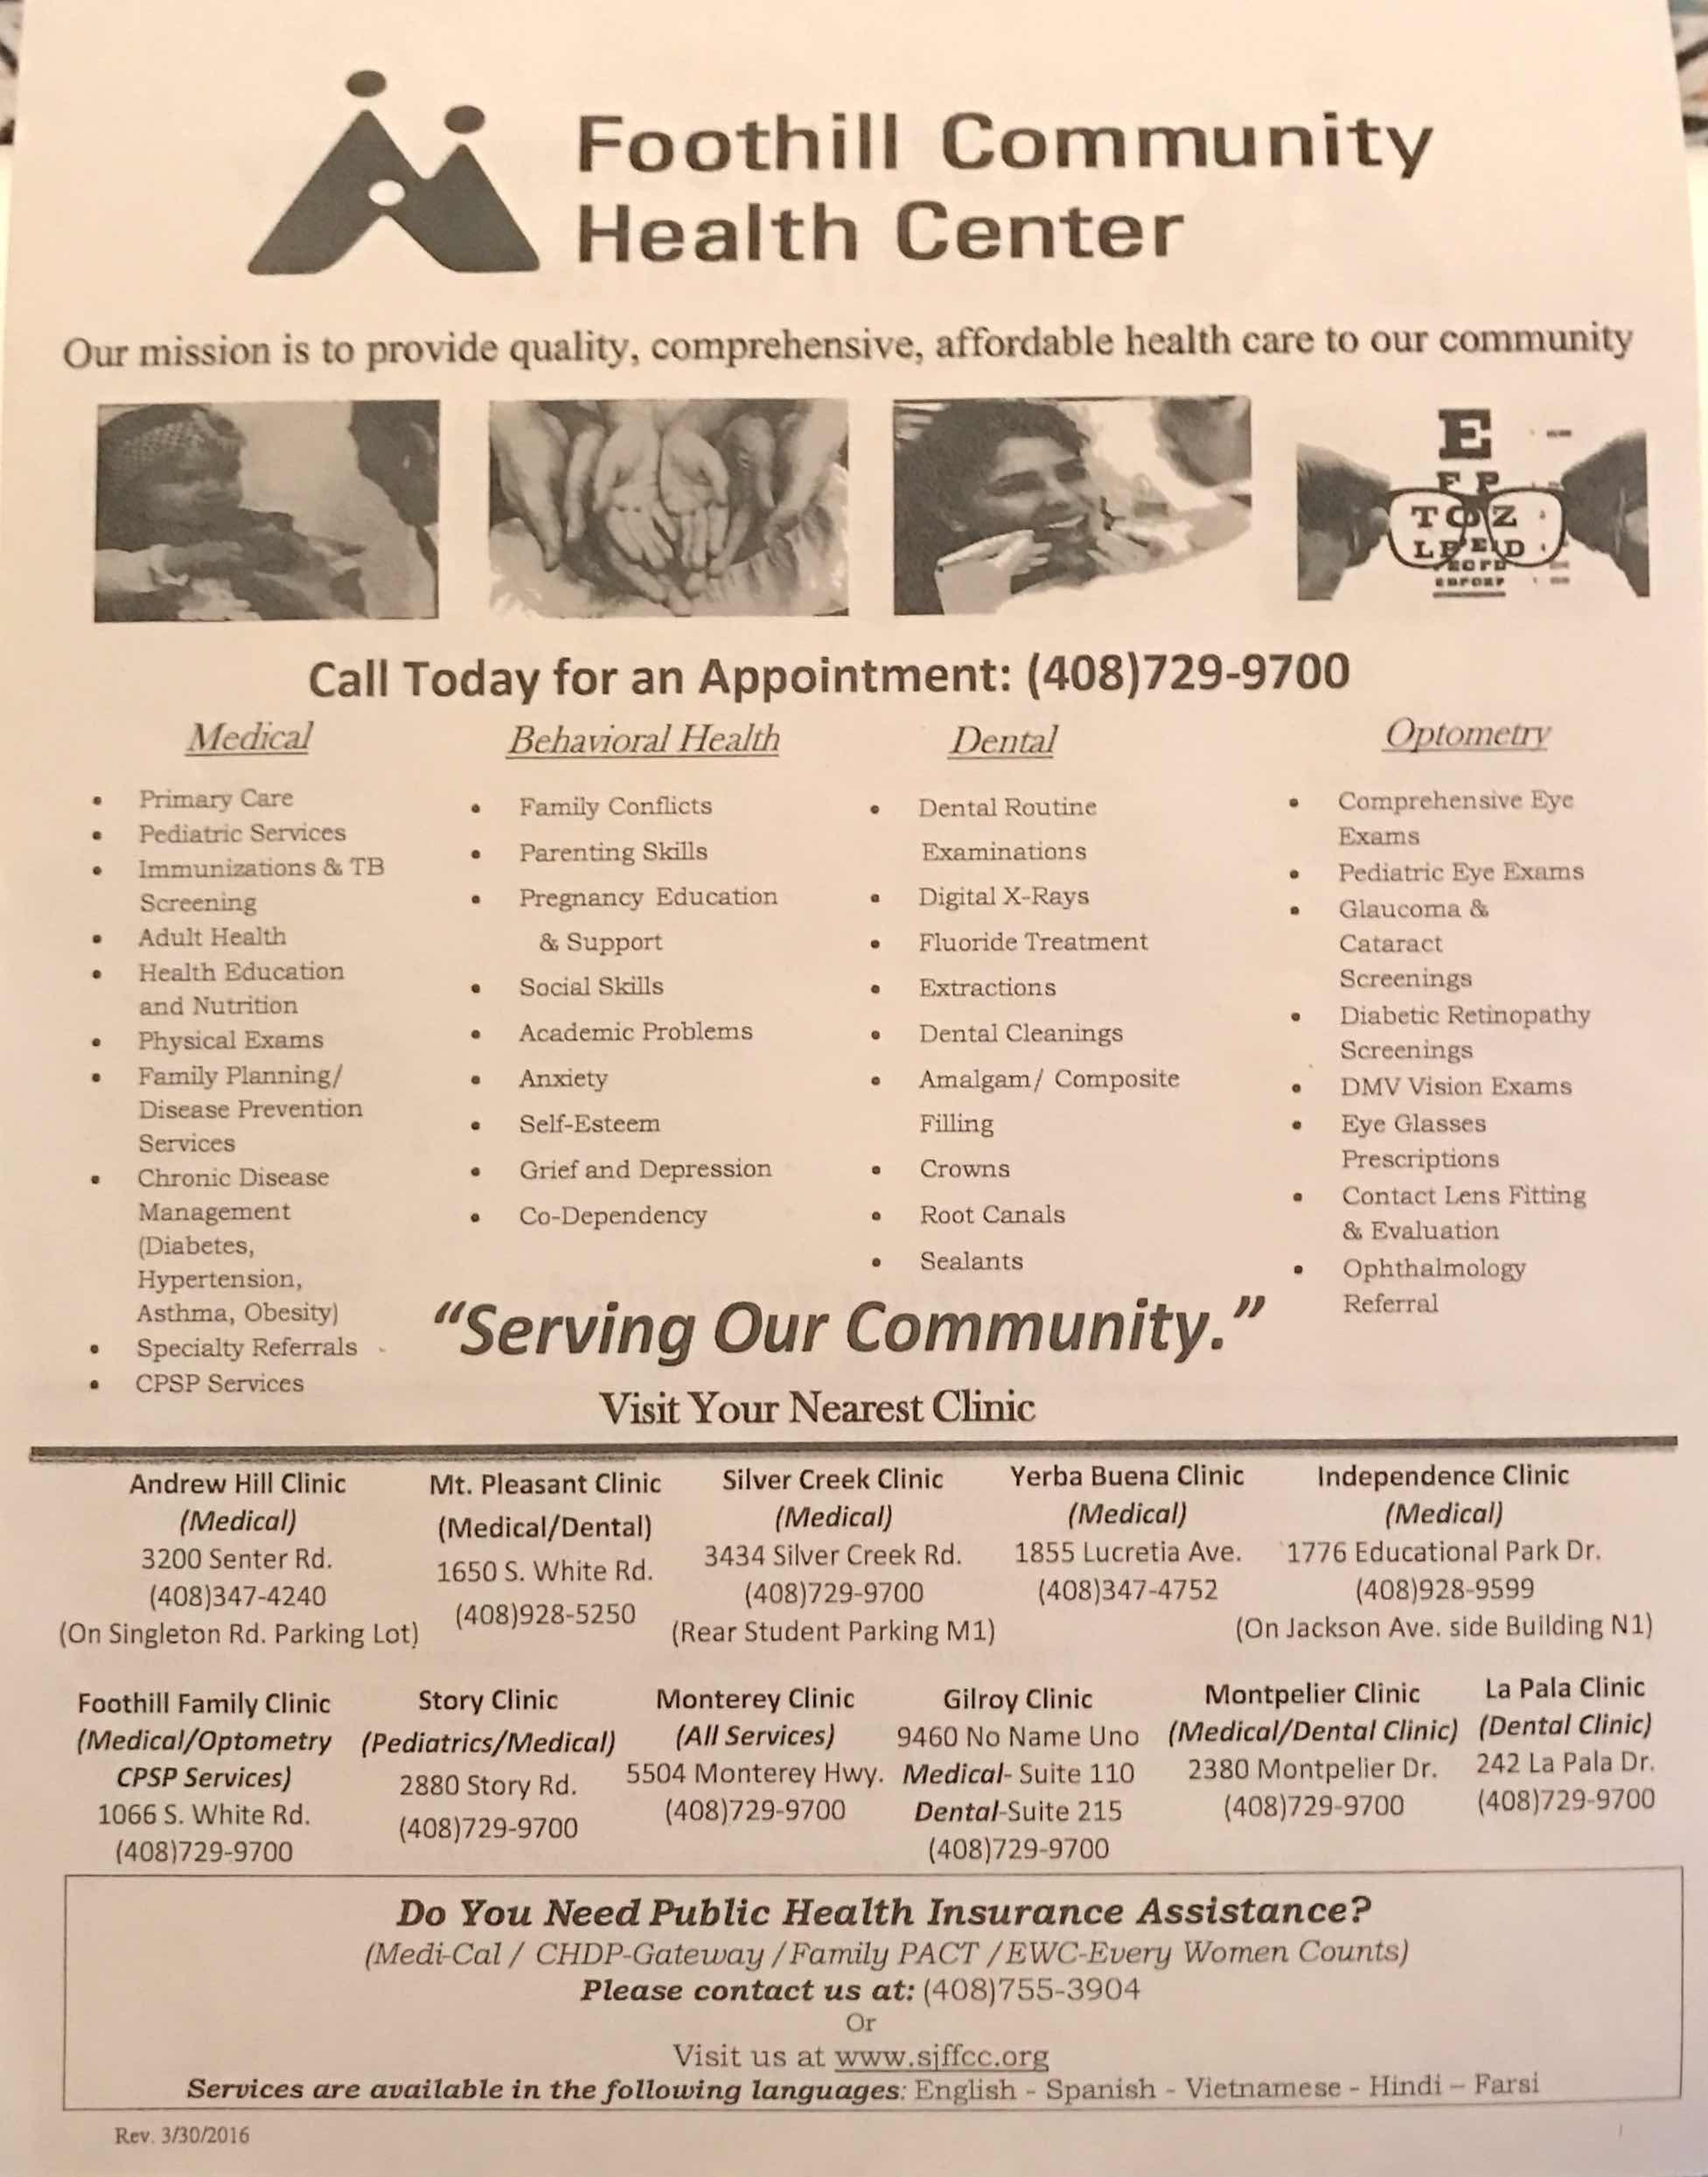 Foothill Community Health Center Flyer 1